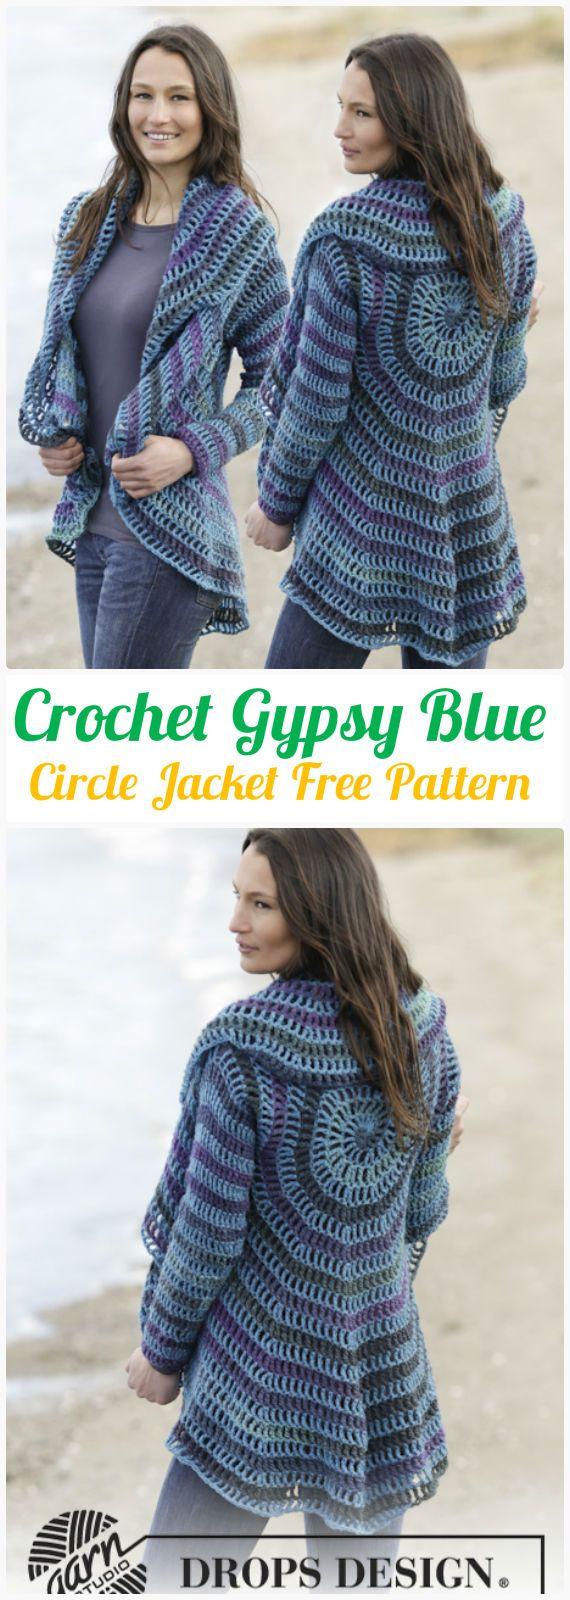 DIY Crochet Gypsy Blue Circle Jacket Free Pattern-Crochet Circular Vest Sweater Jacket Patterns